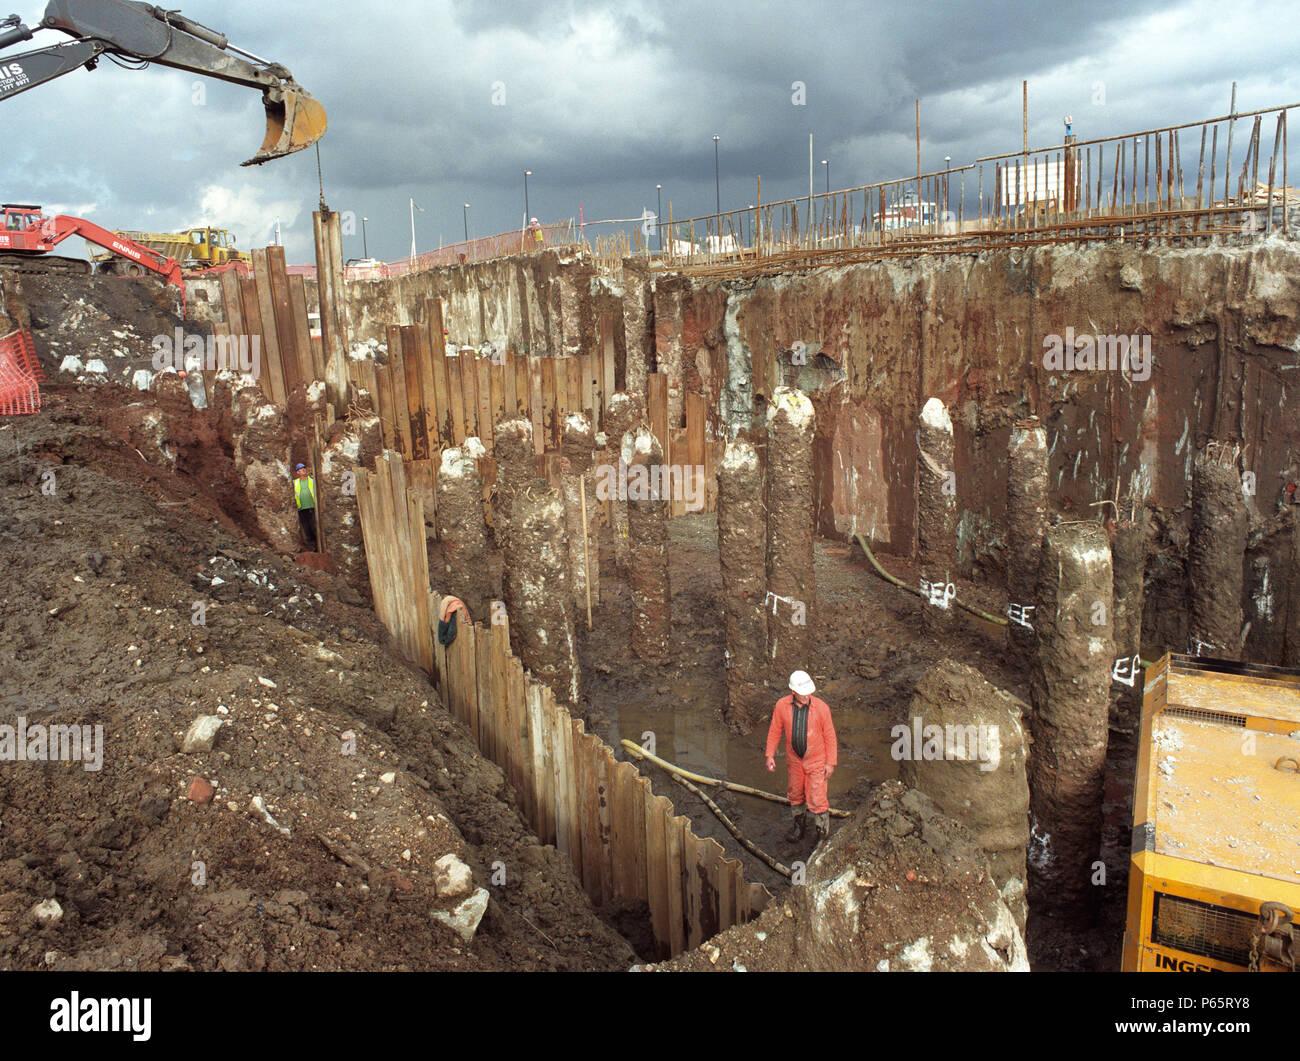 Reinforced concrete columns stock photos reinforced for Concrete pillars for foundation